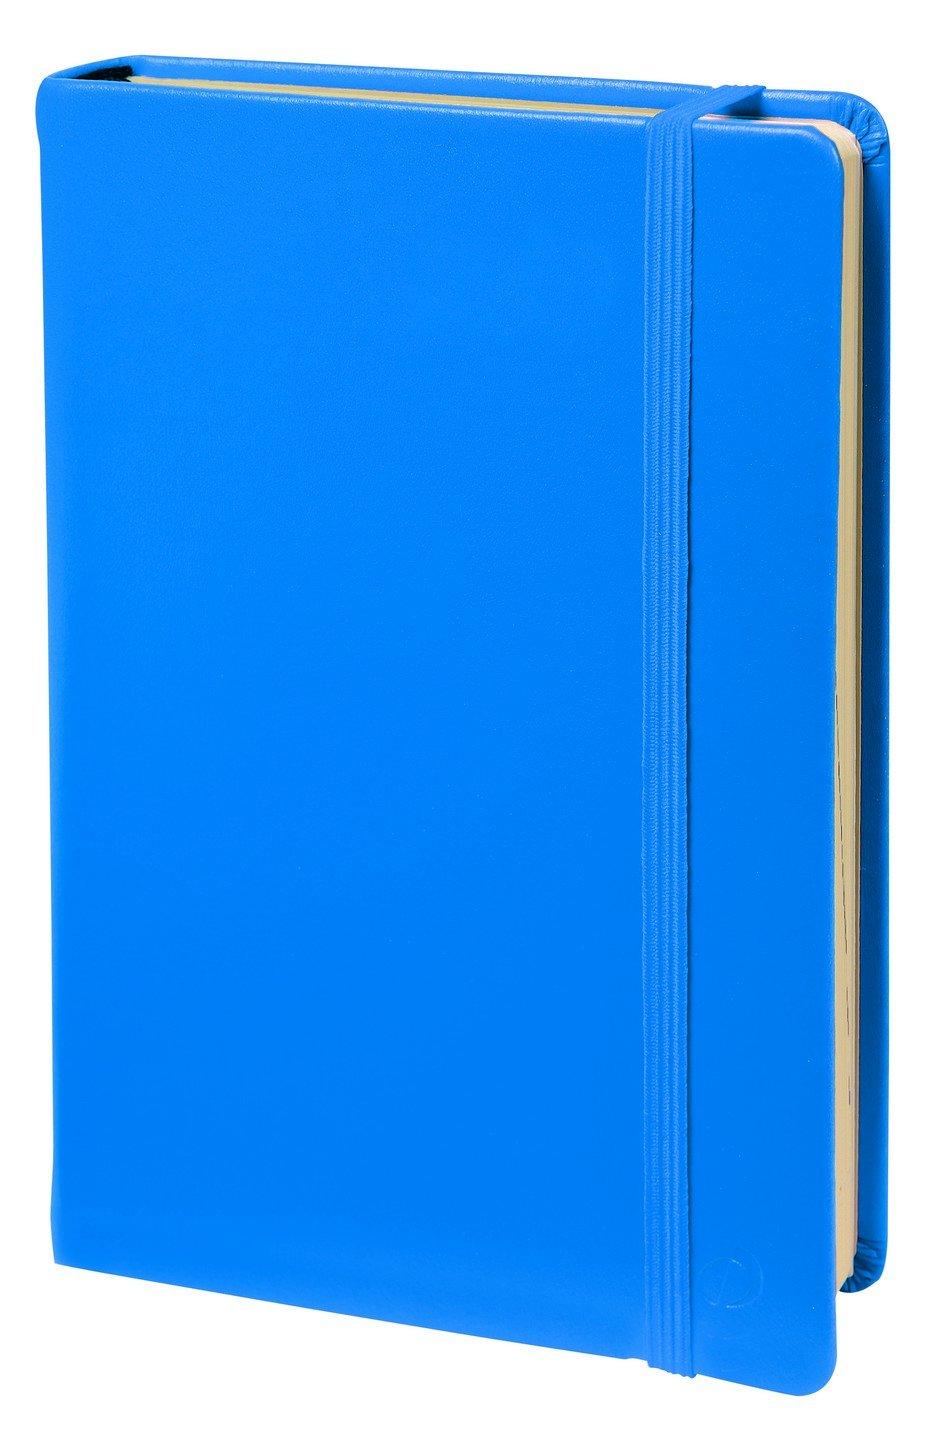 Quo Vadis Habana Ruled Note Book 10x 15cm Blue